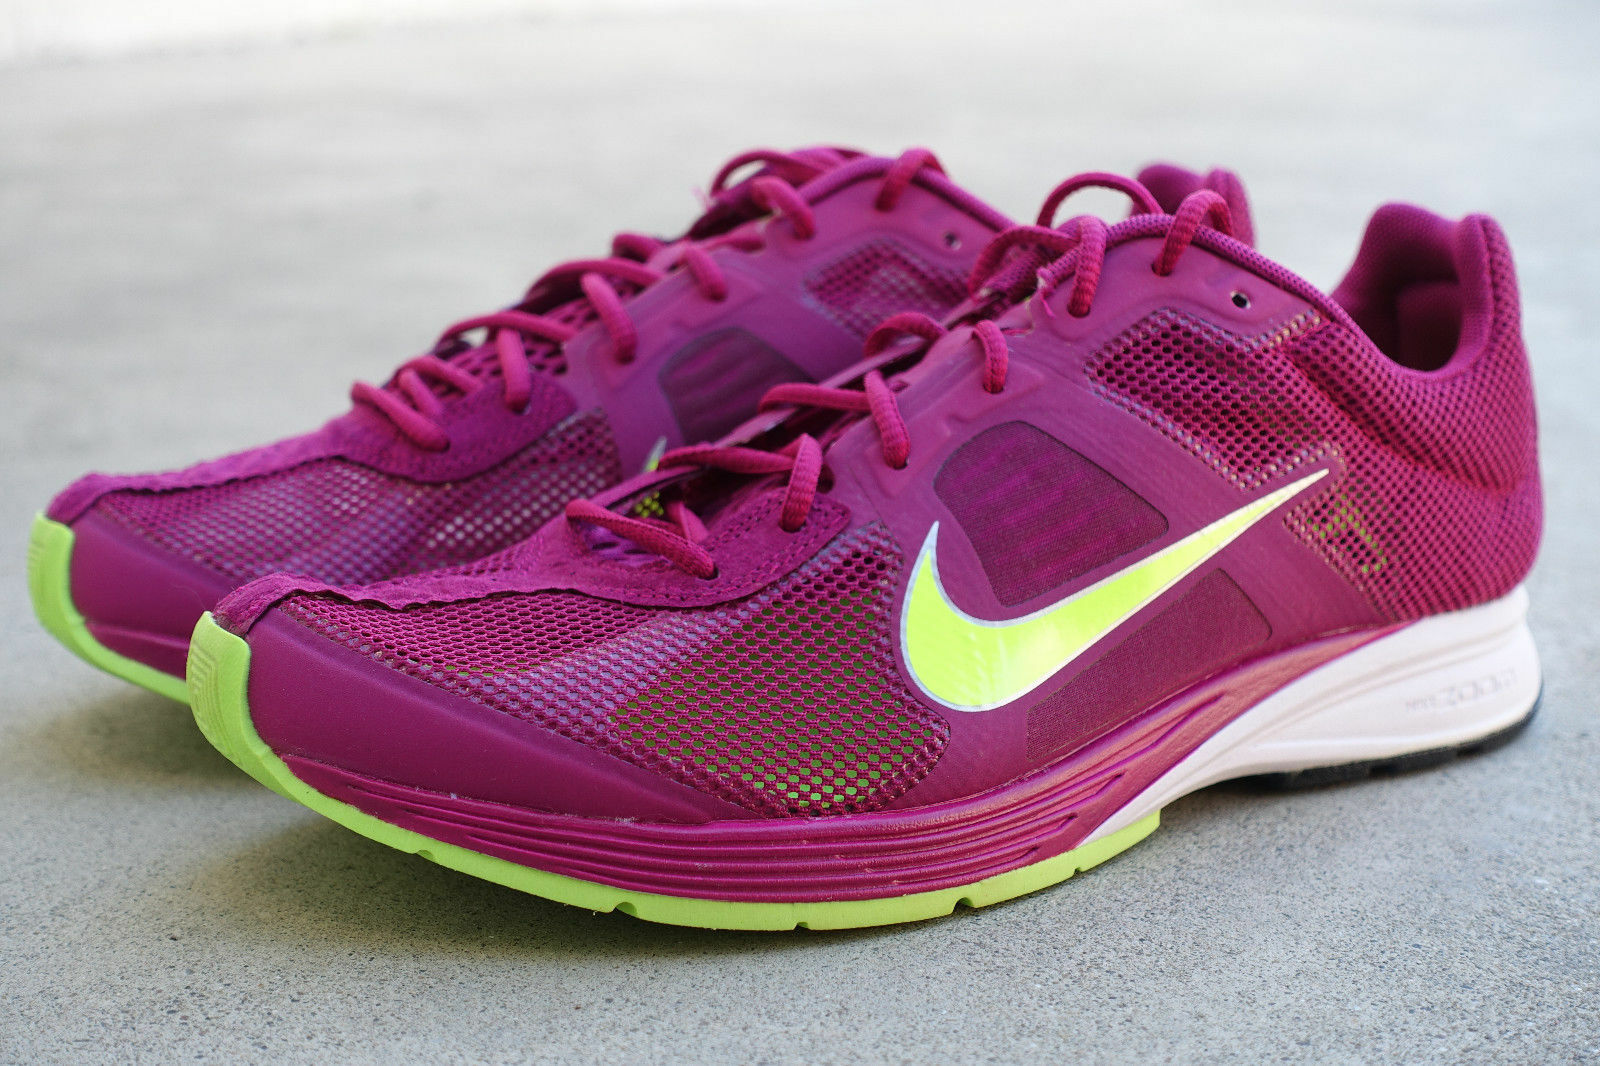 Nike Zoom Streak 4 Running shoes Sz Men-5.5     Wmn-7 NEW 511591 507 BrightMagenta ee57f9